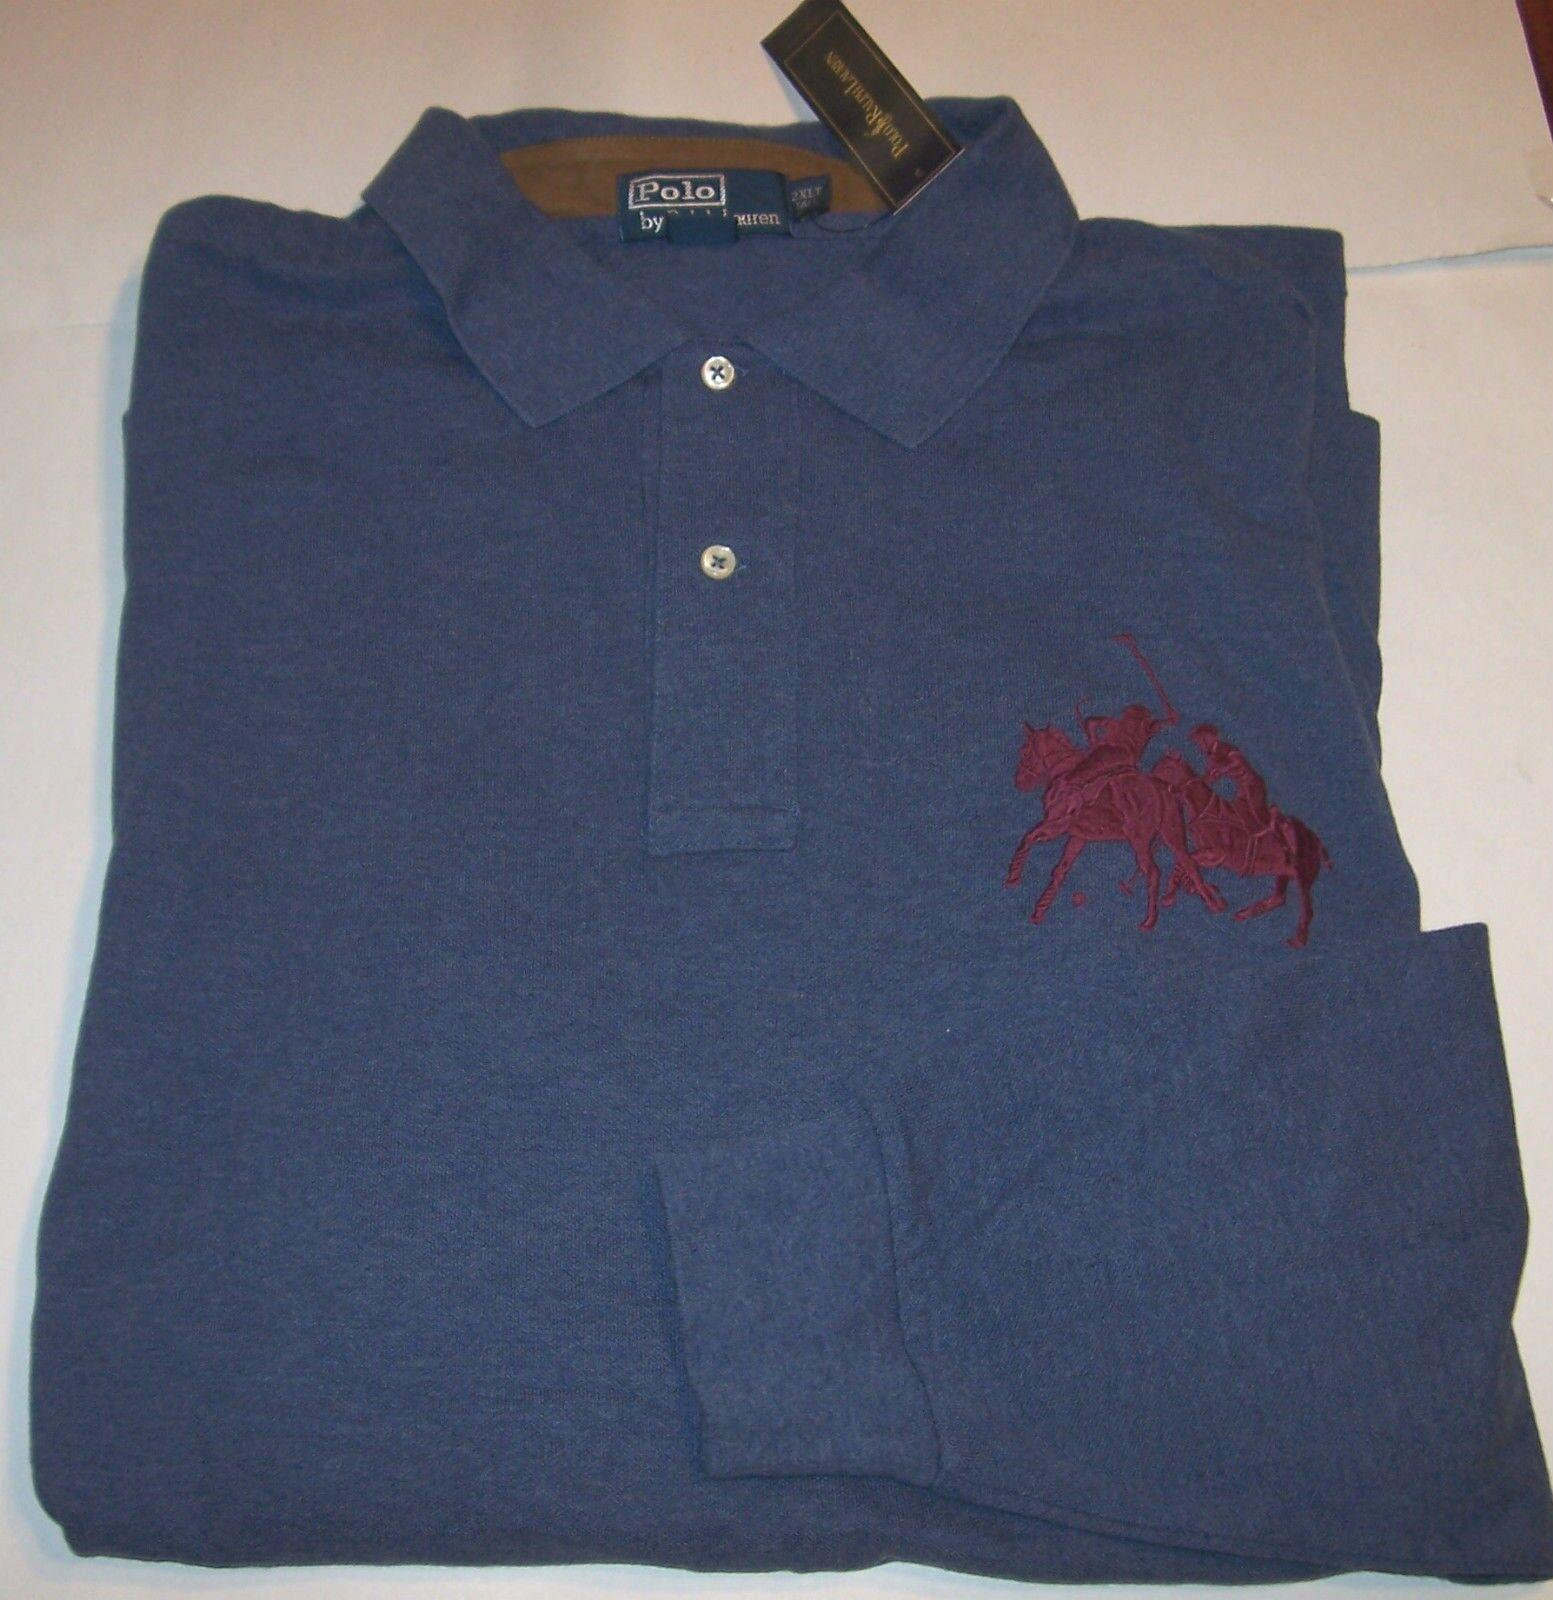 7f6b9e080 ... germany ralph lauren polo long sleeve mesh shirt dual match blue 2xlt  big c2f4e 261b0